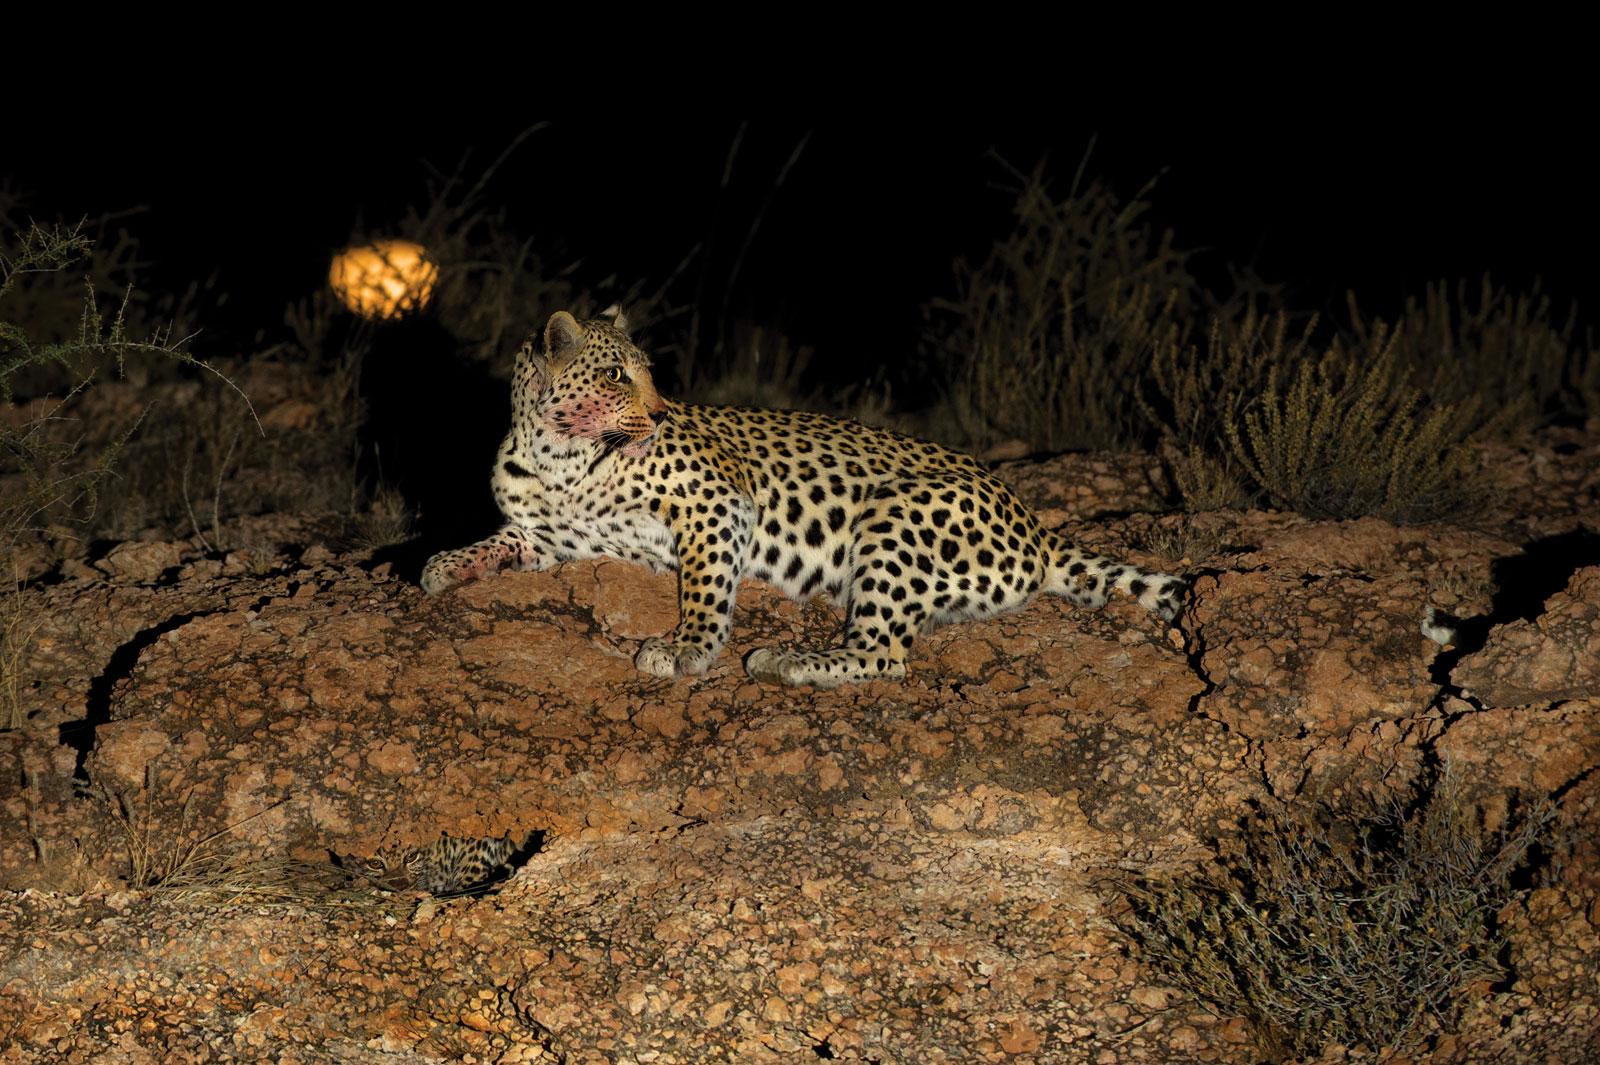 Hannes-Lochner-Kalahari-leopard-and-cub